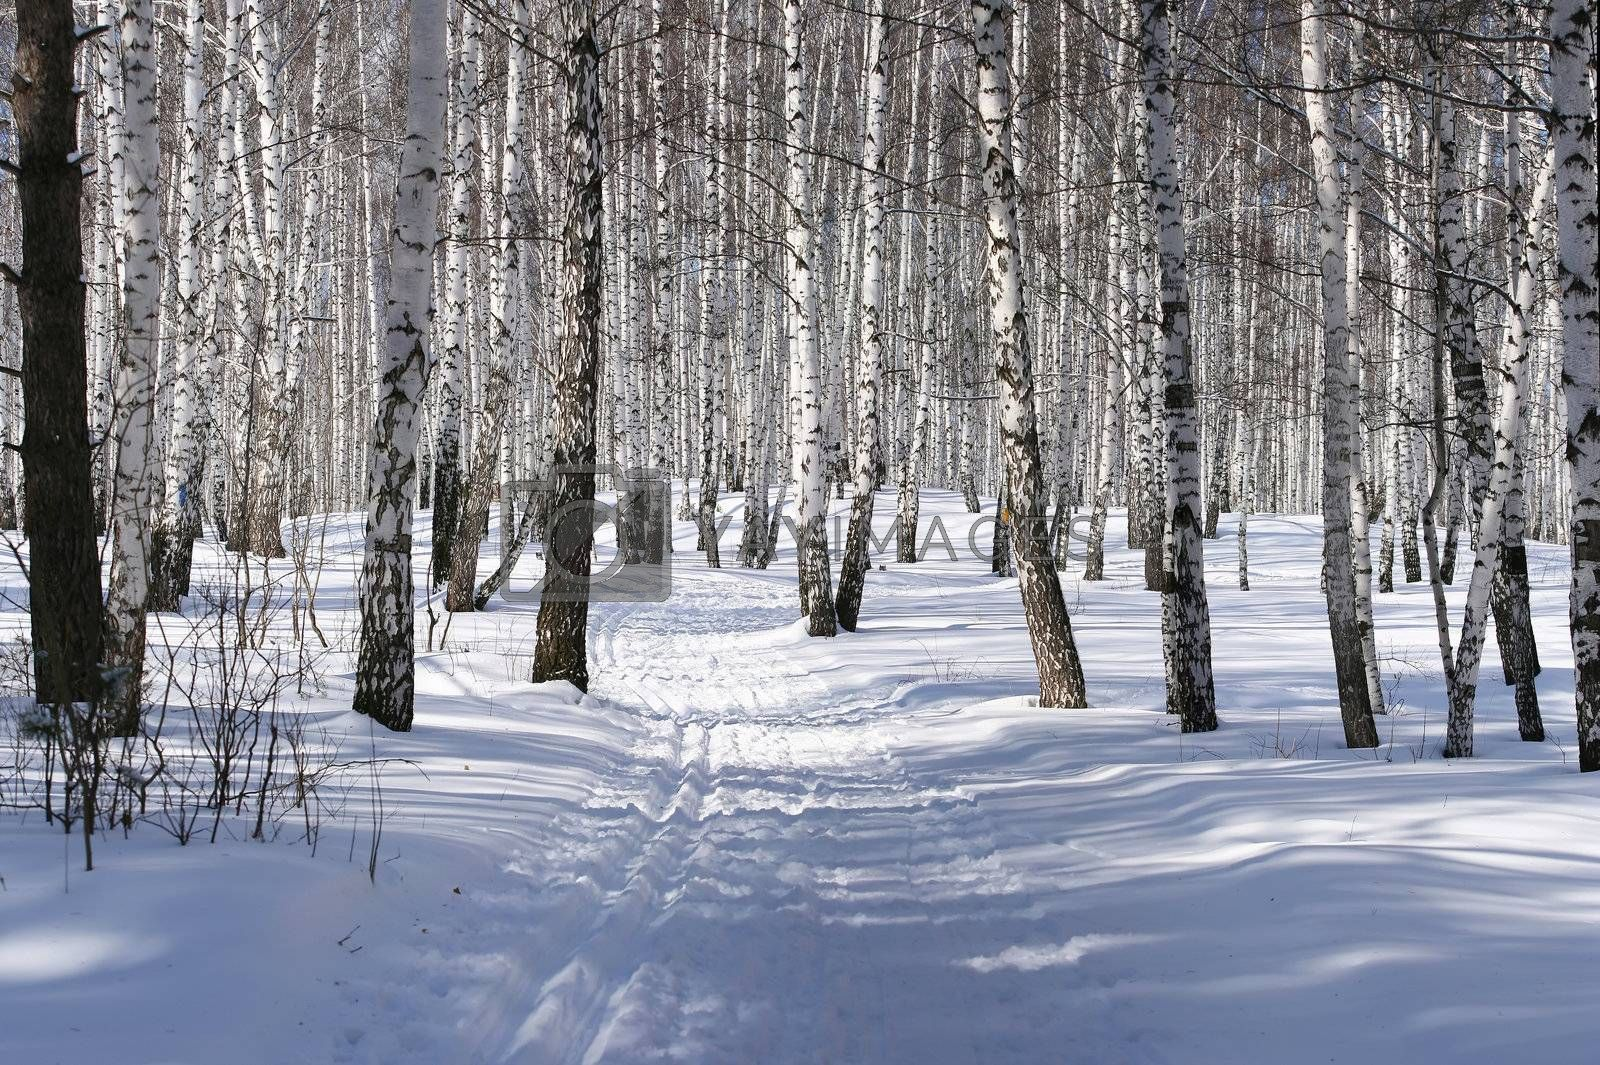 ski-track in a birch forest